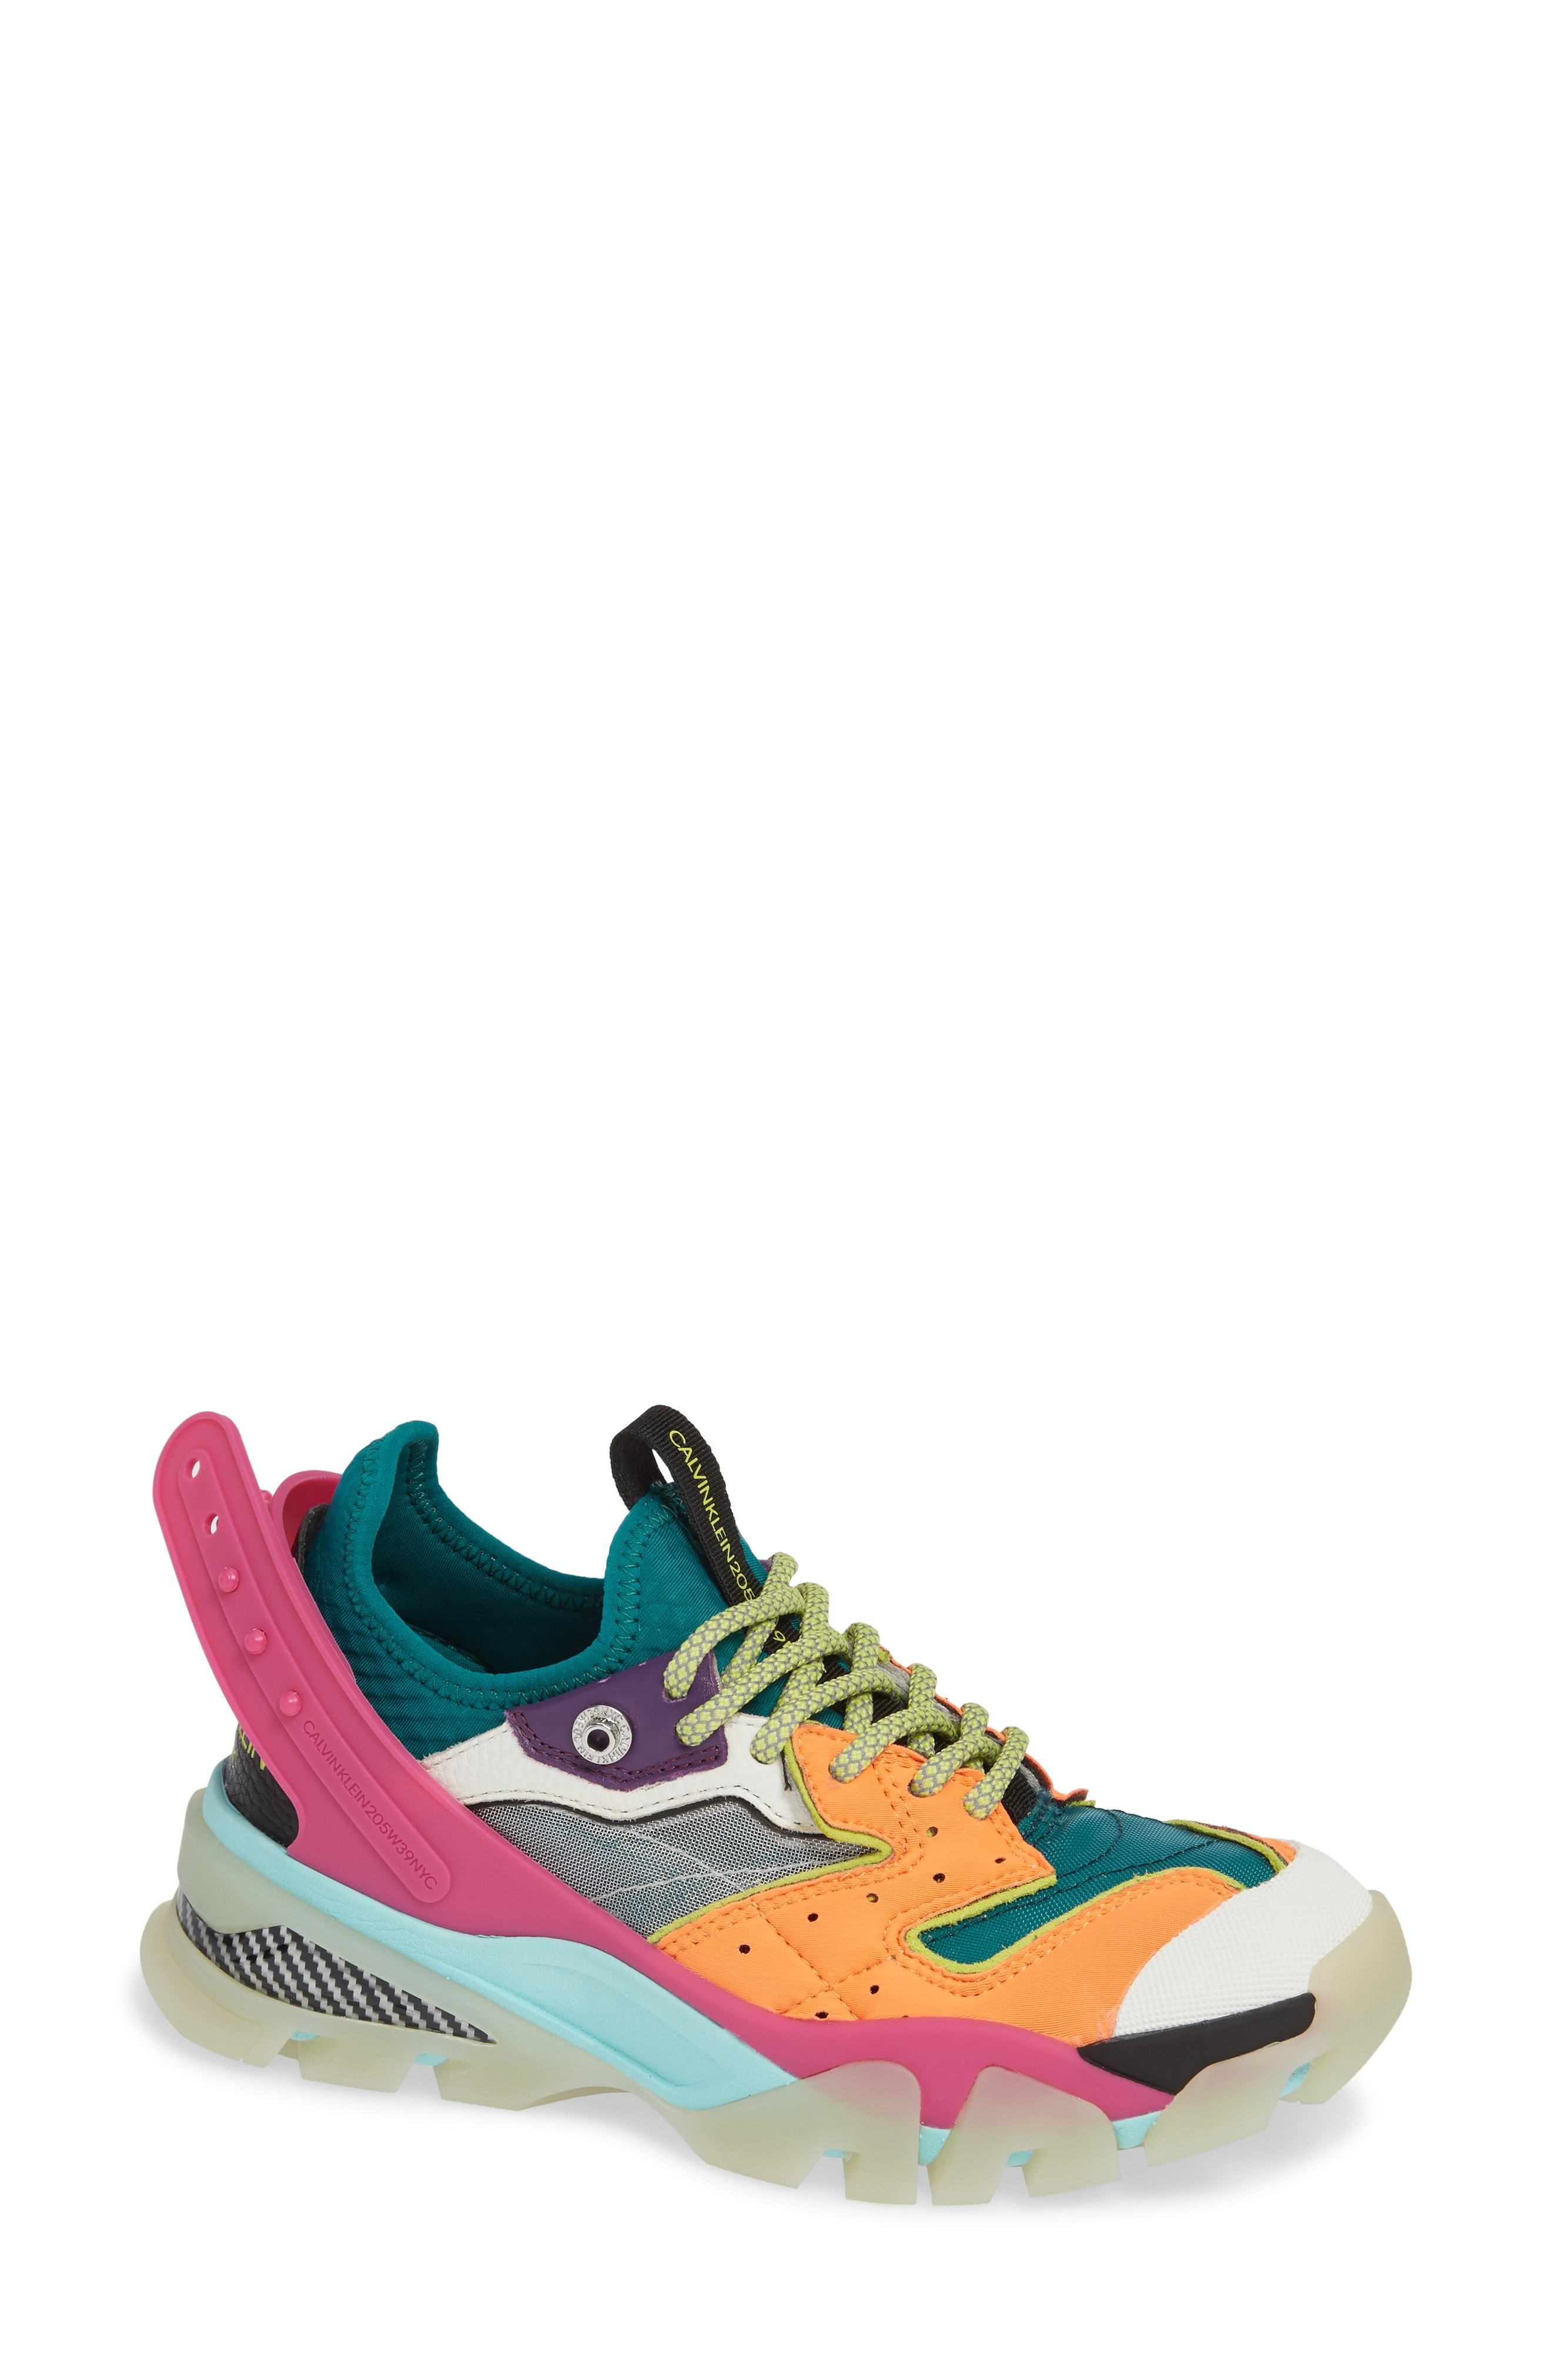 a9921eb03c1 ... Shoes Calvin Klein 205w39nyc Carla Sneaker